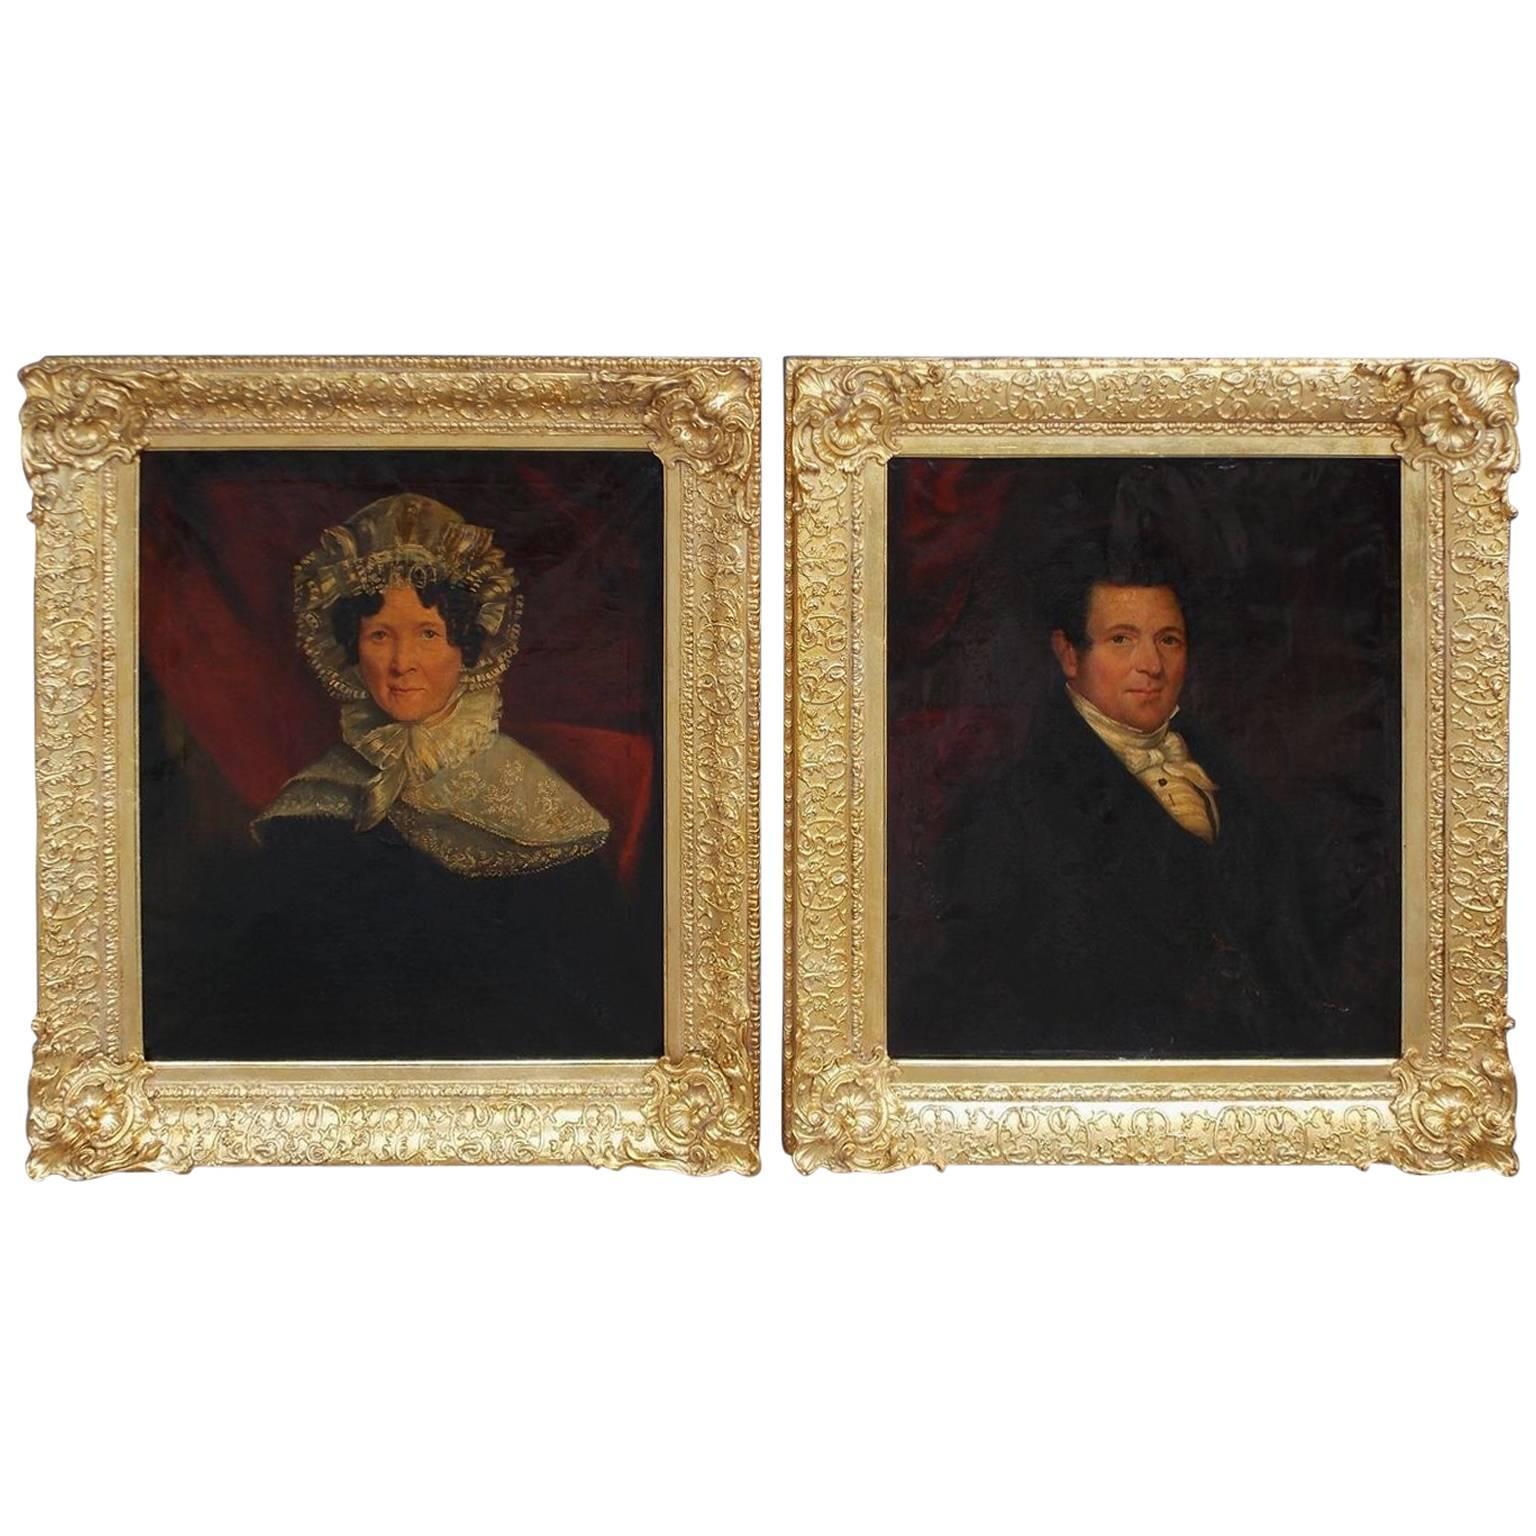 Pair of American Oil on Canvas Gilt Framed Portraits, S.C., Circa 1770